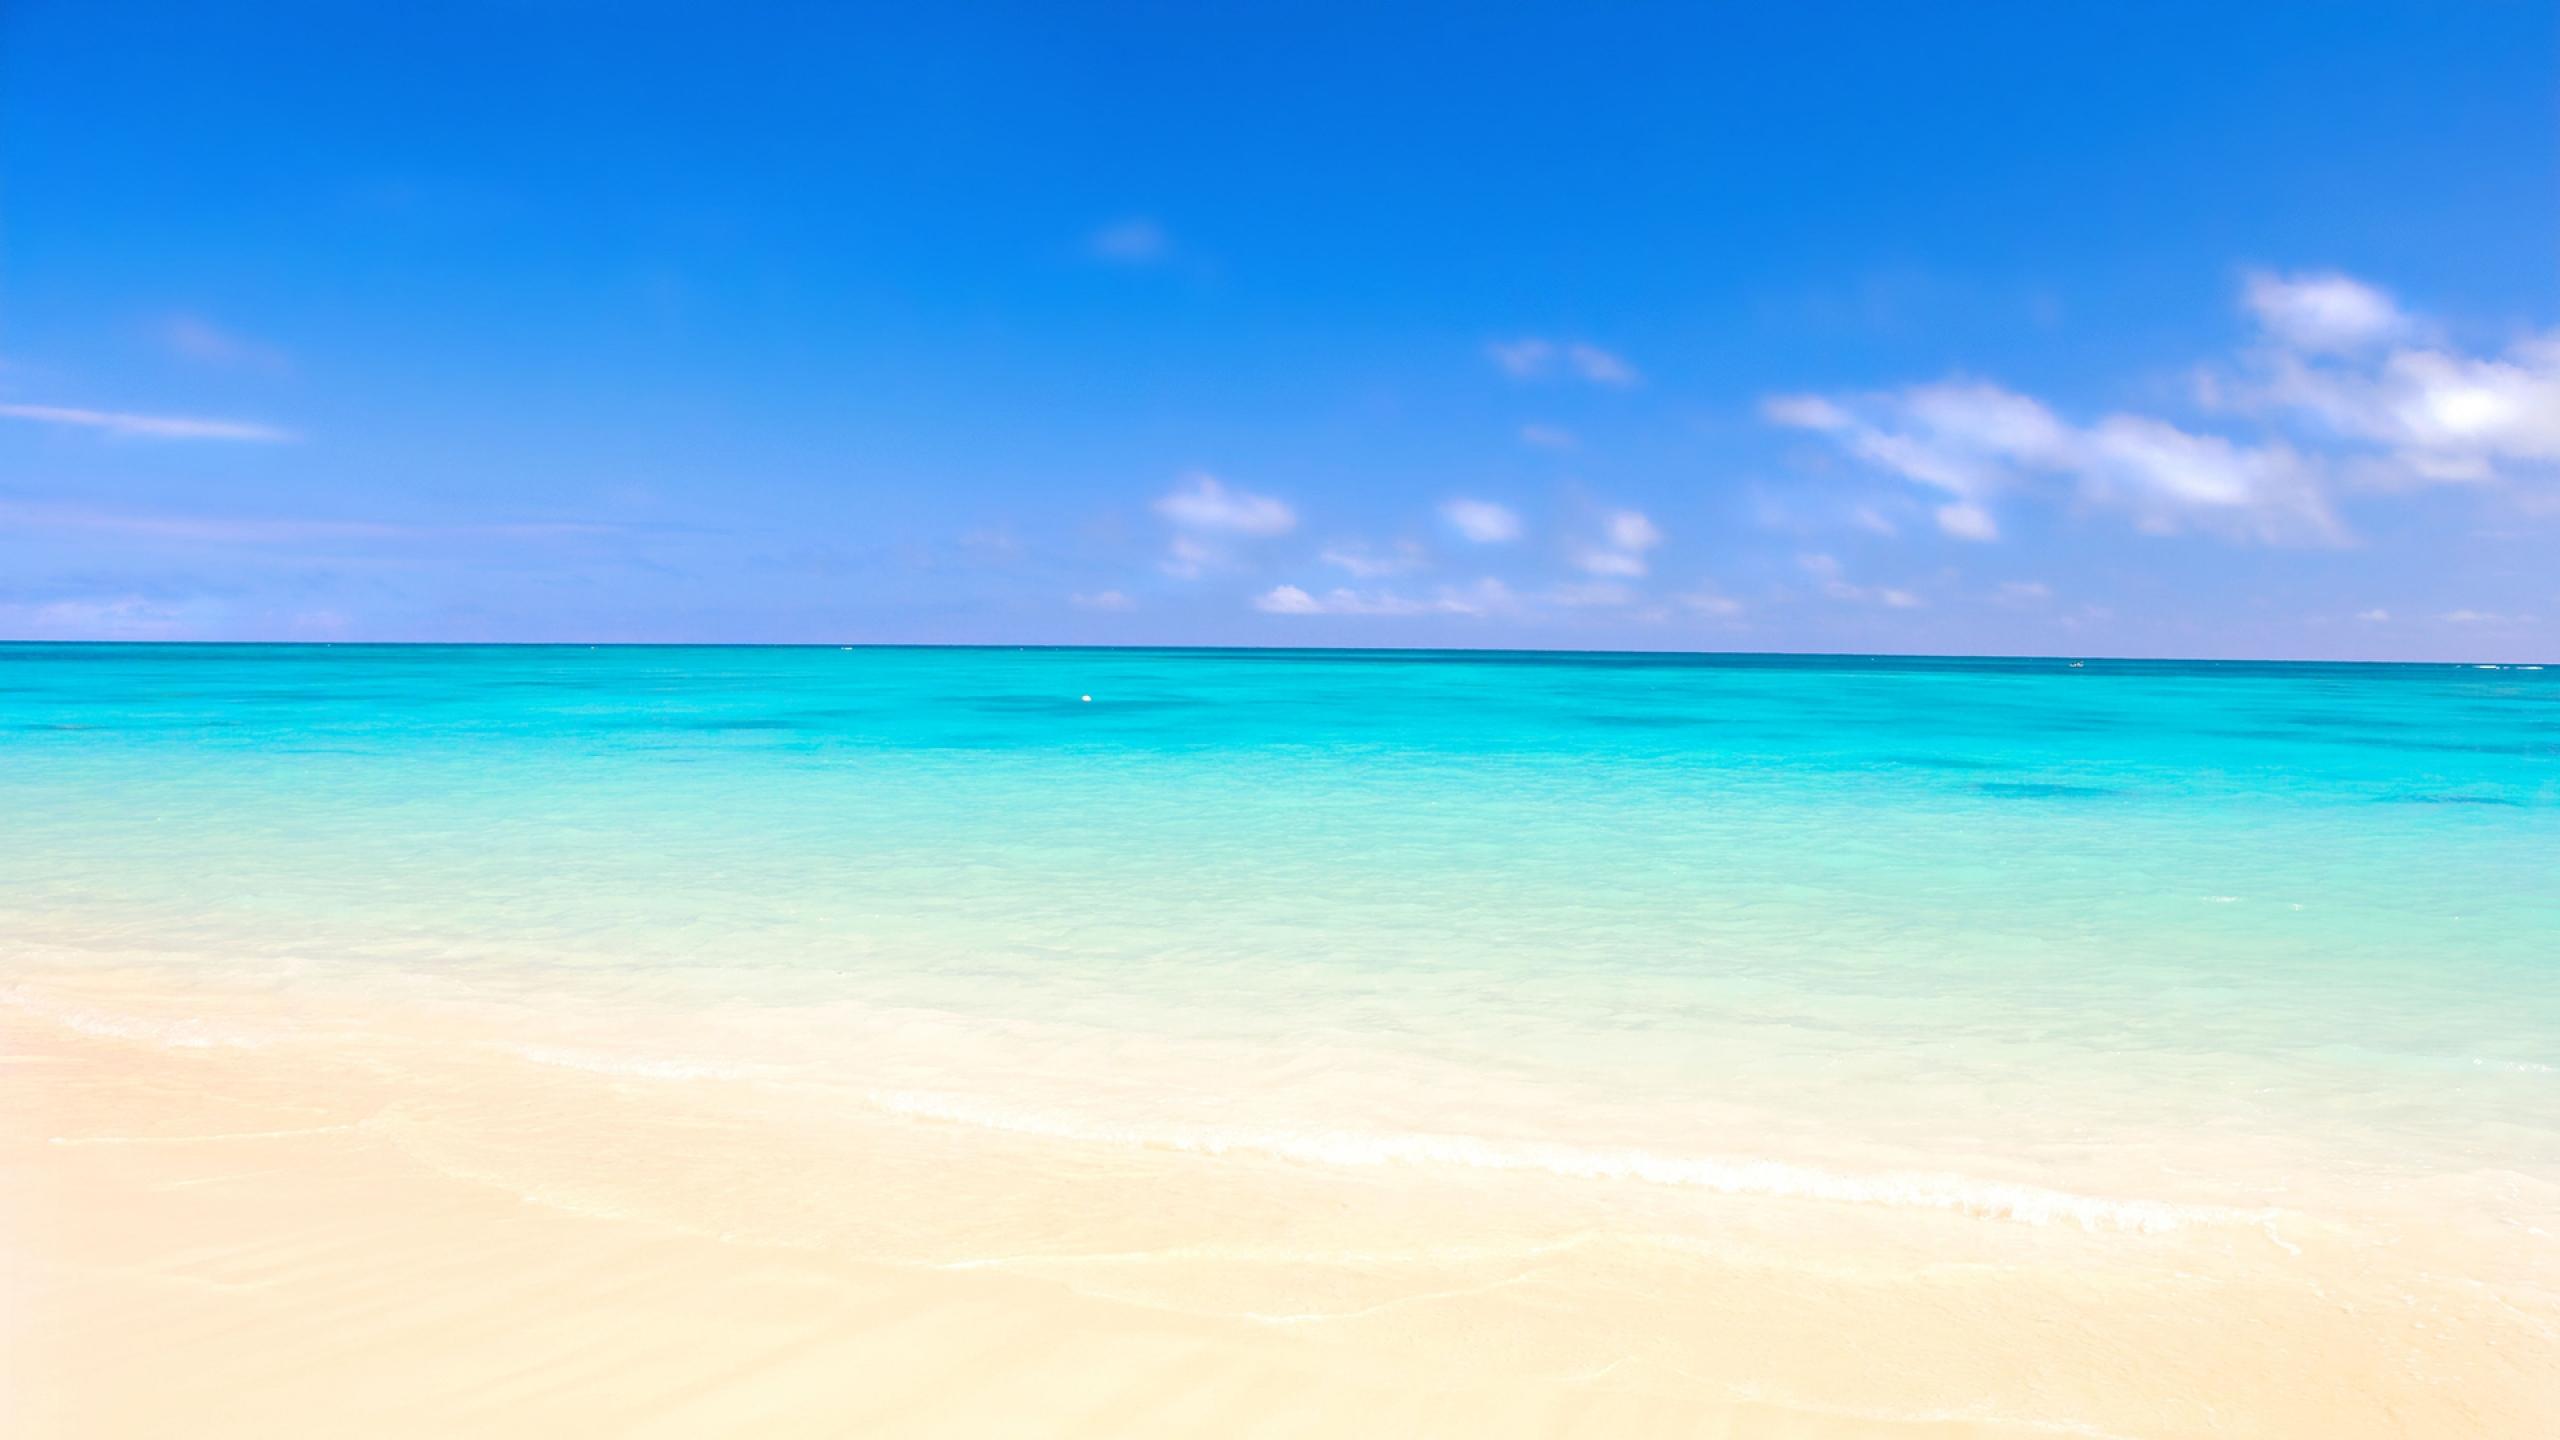 Download Wallpaper 2560x1440 ocean sand beach Mac iMac 27 HD 2560x1440